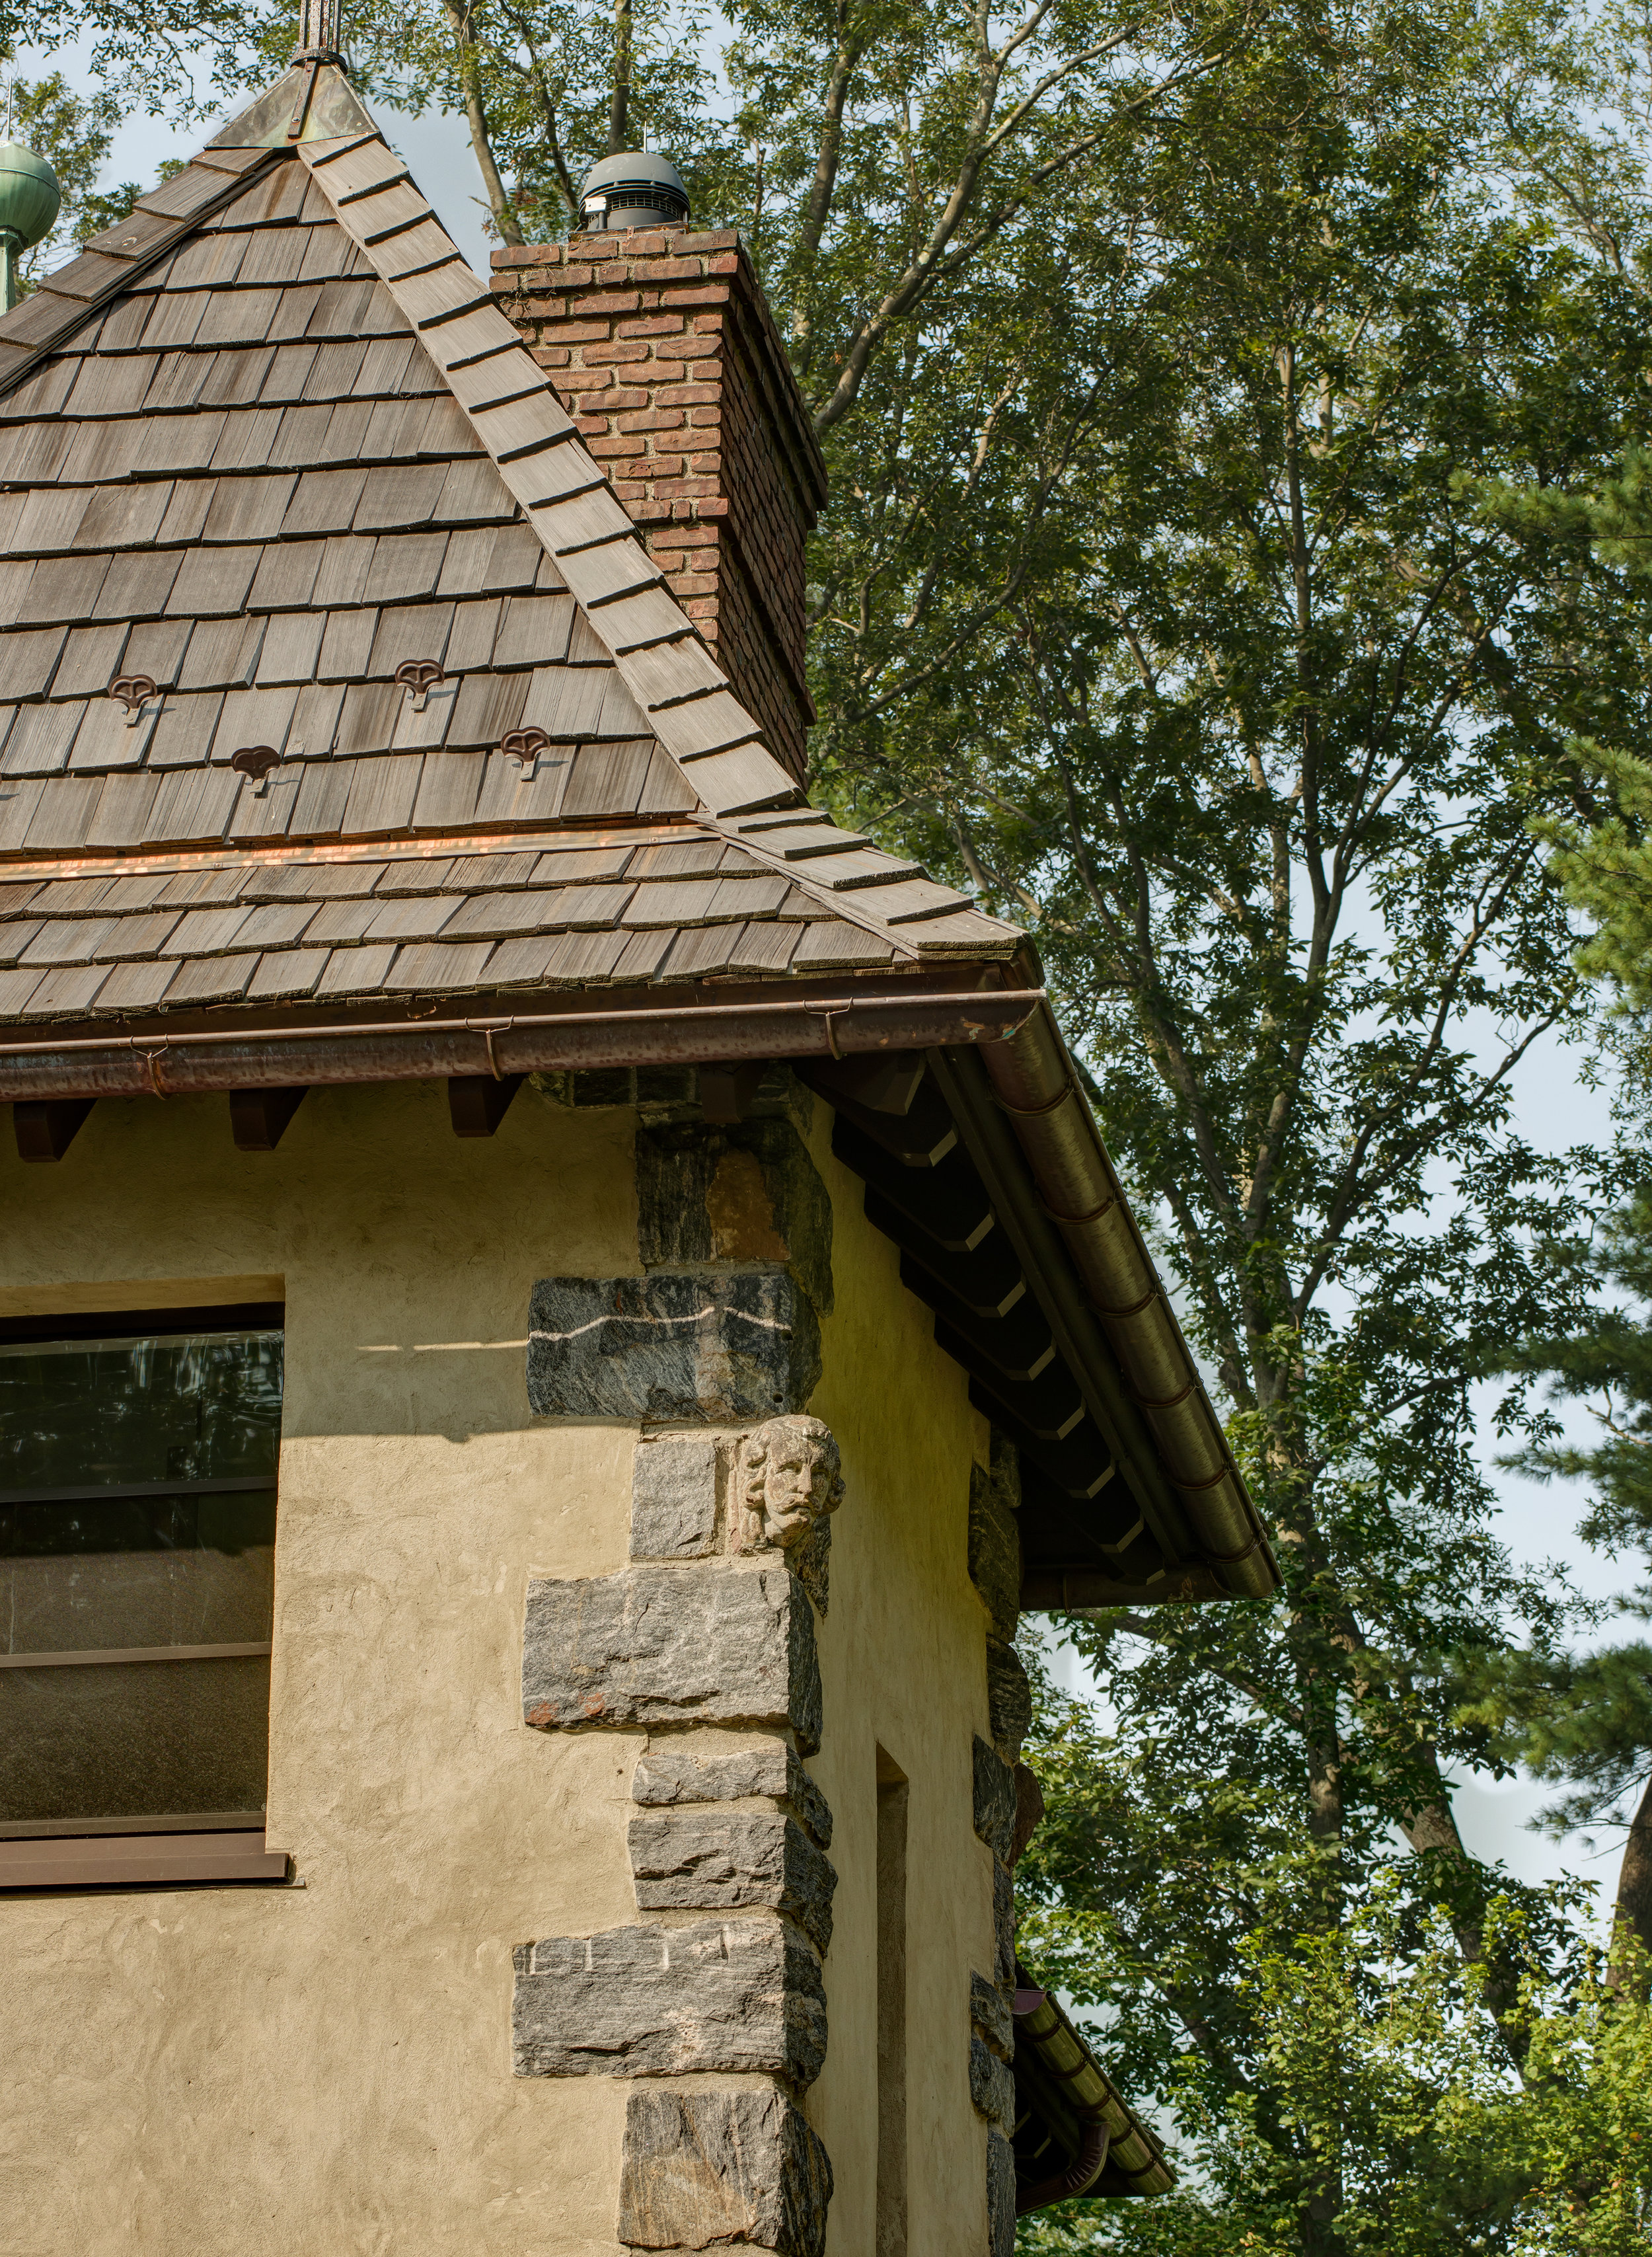 slate shingles brick chimney stone belfry bell tower